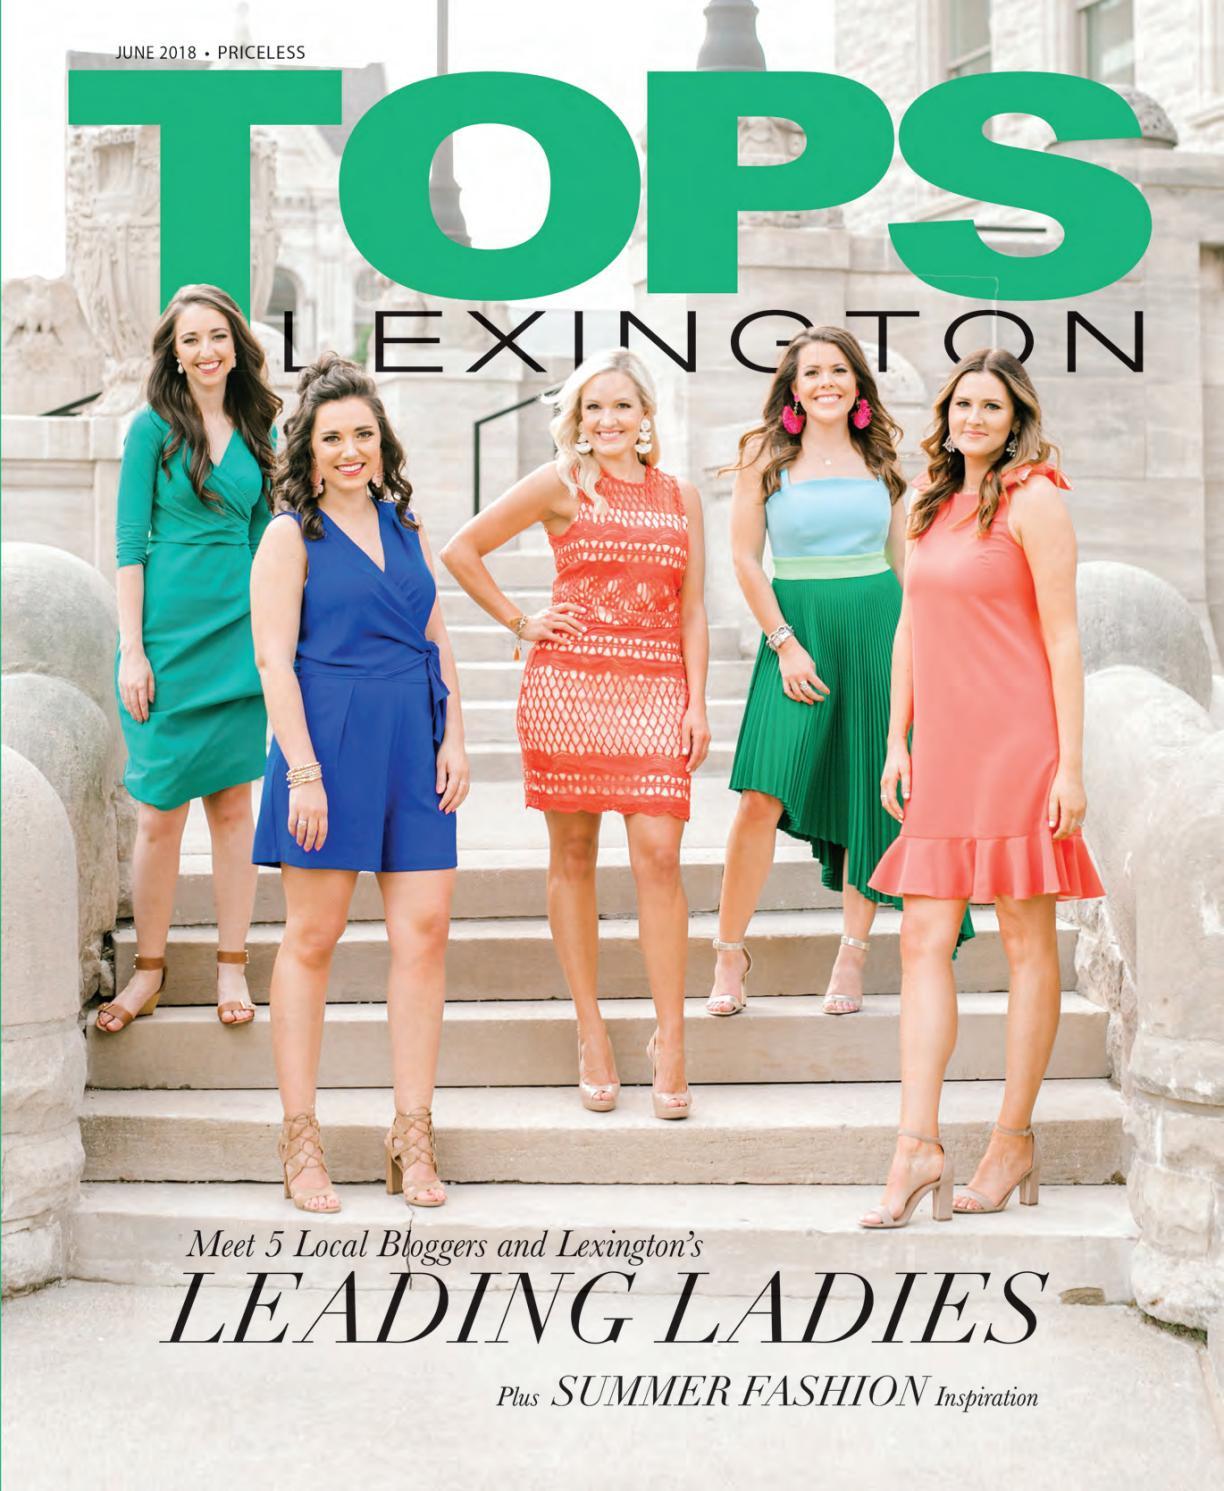 98070f708de71e Tops in Lexington - June 2018 by TOPS Magazine - issuu